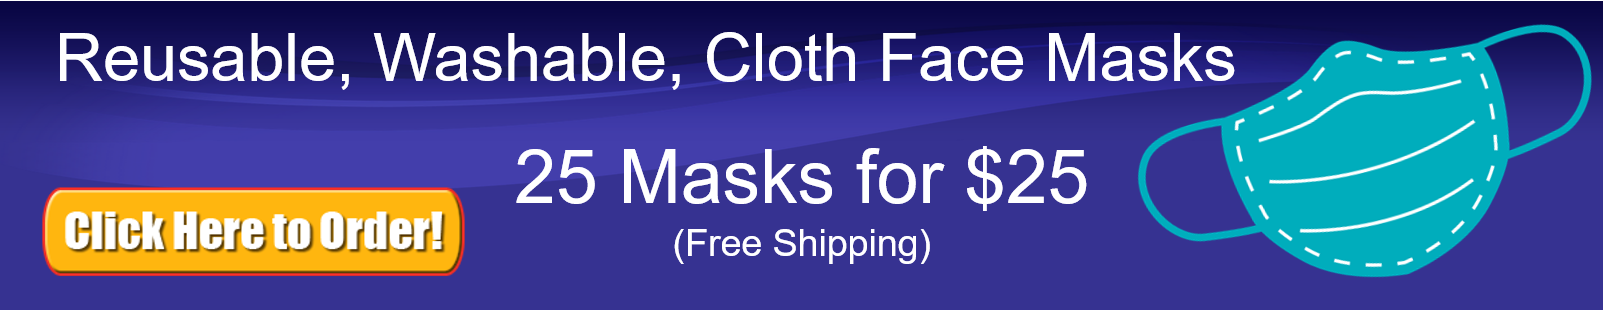 face-masks-safety-alliance-cloth